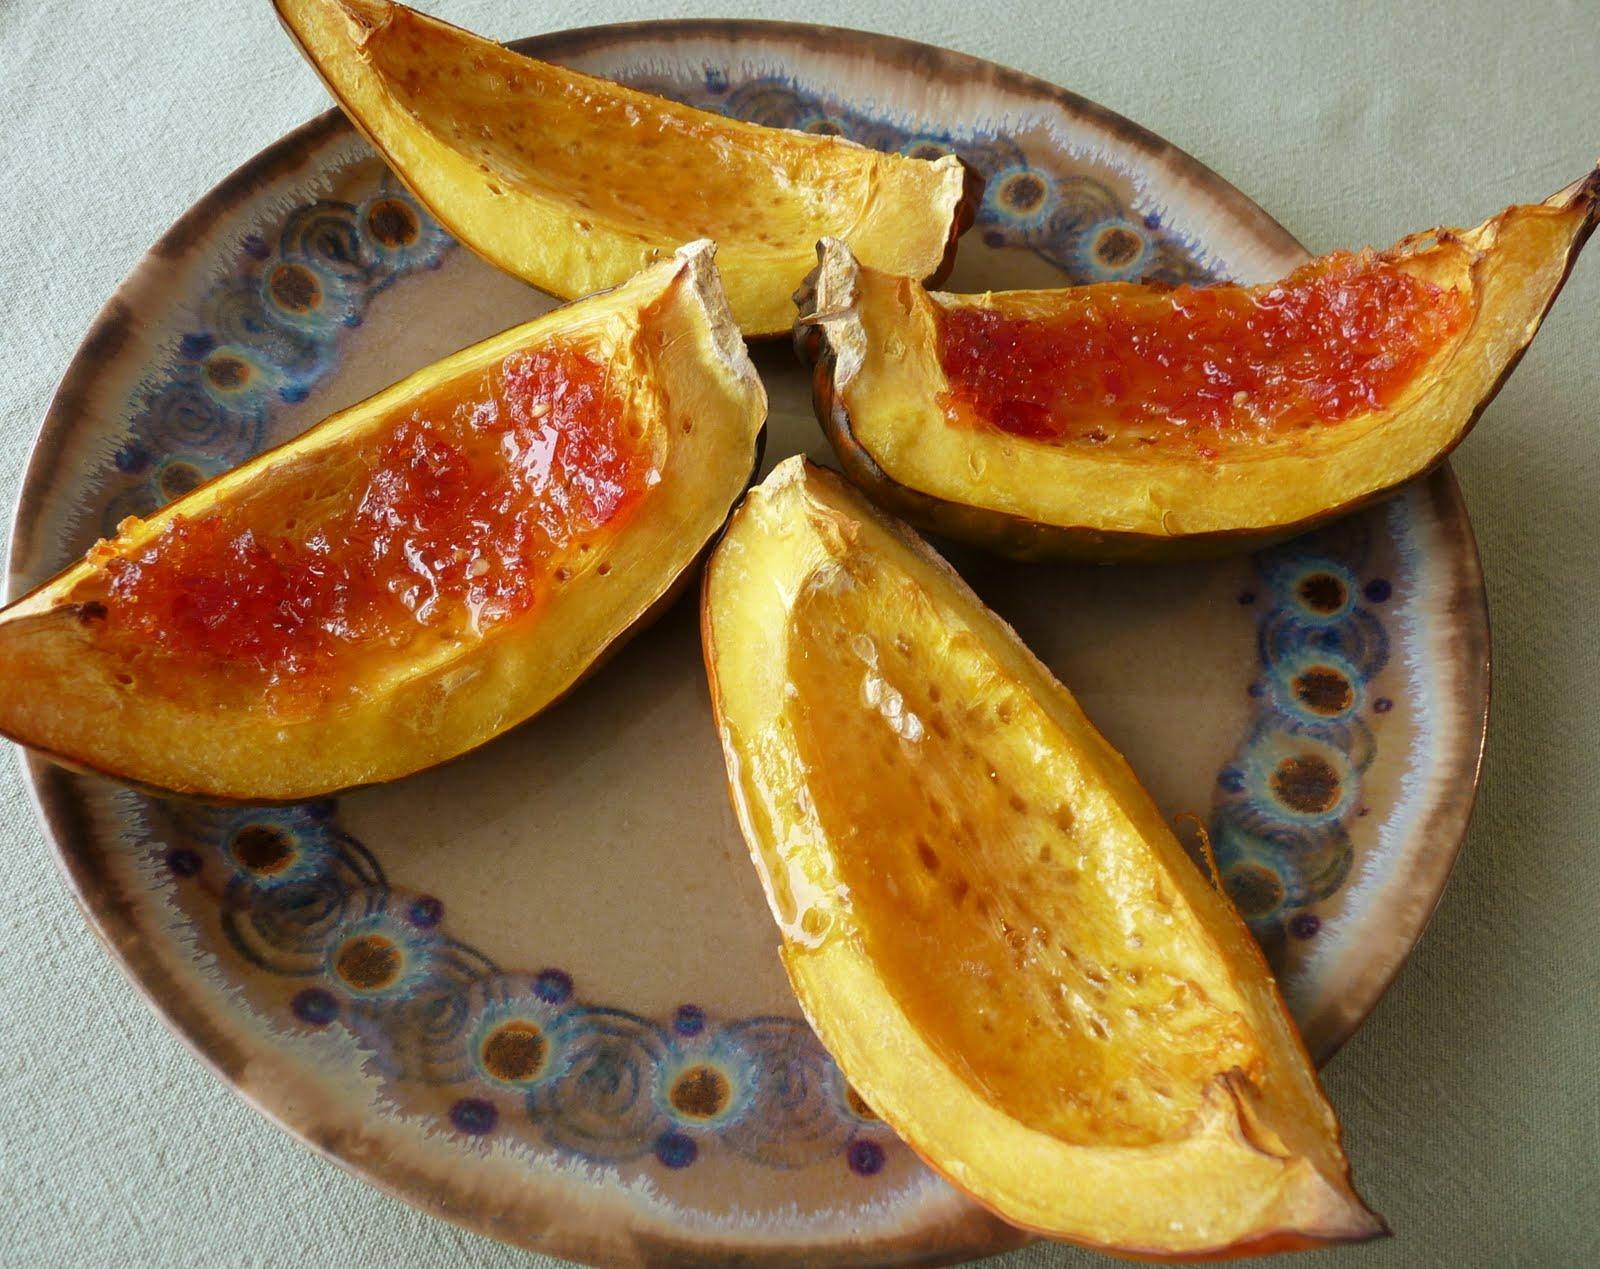 Seasonal Ontario Food: Jelly-Glazed Acorn Squash